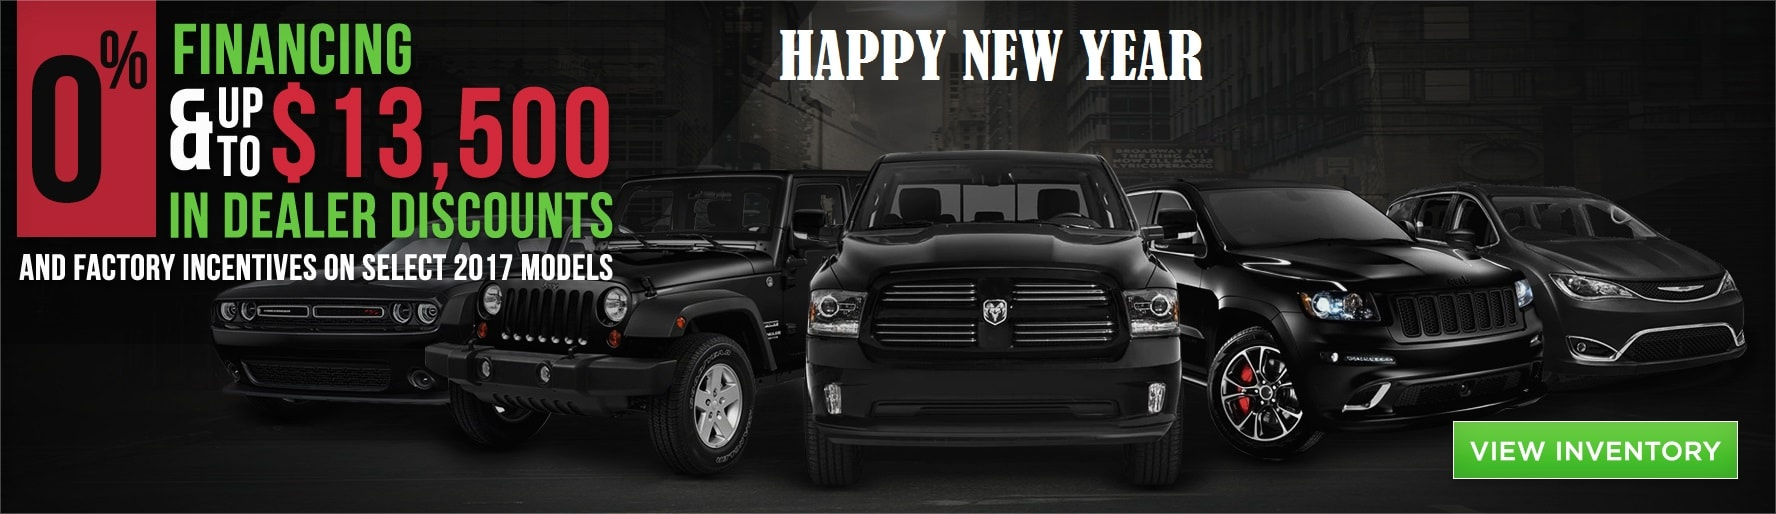 Ontario Chrysler Jeep Dodge Ram Dealership | Toronto ...